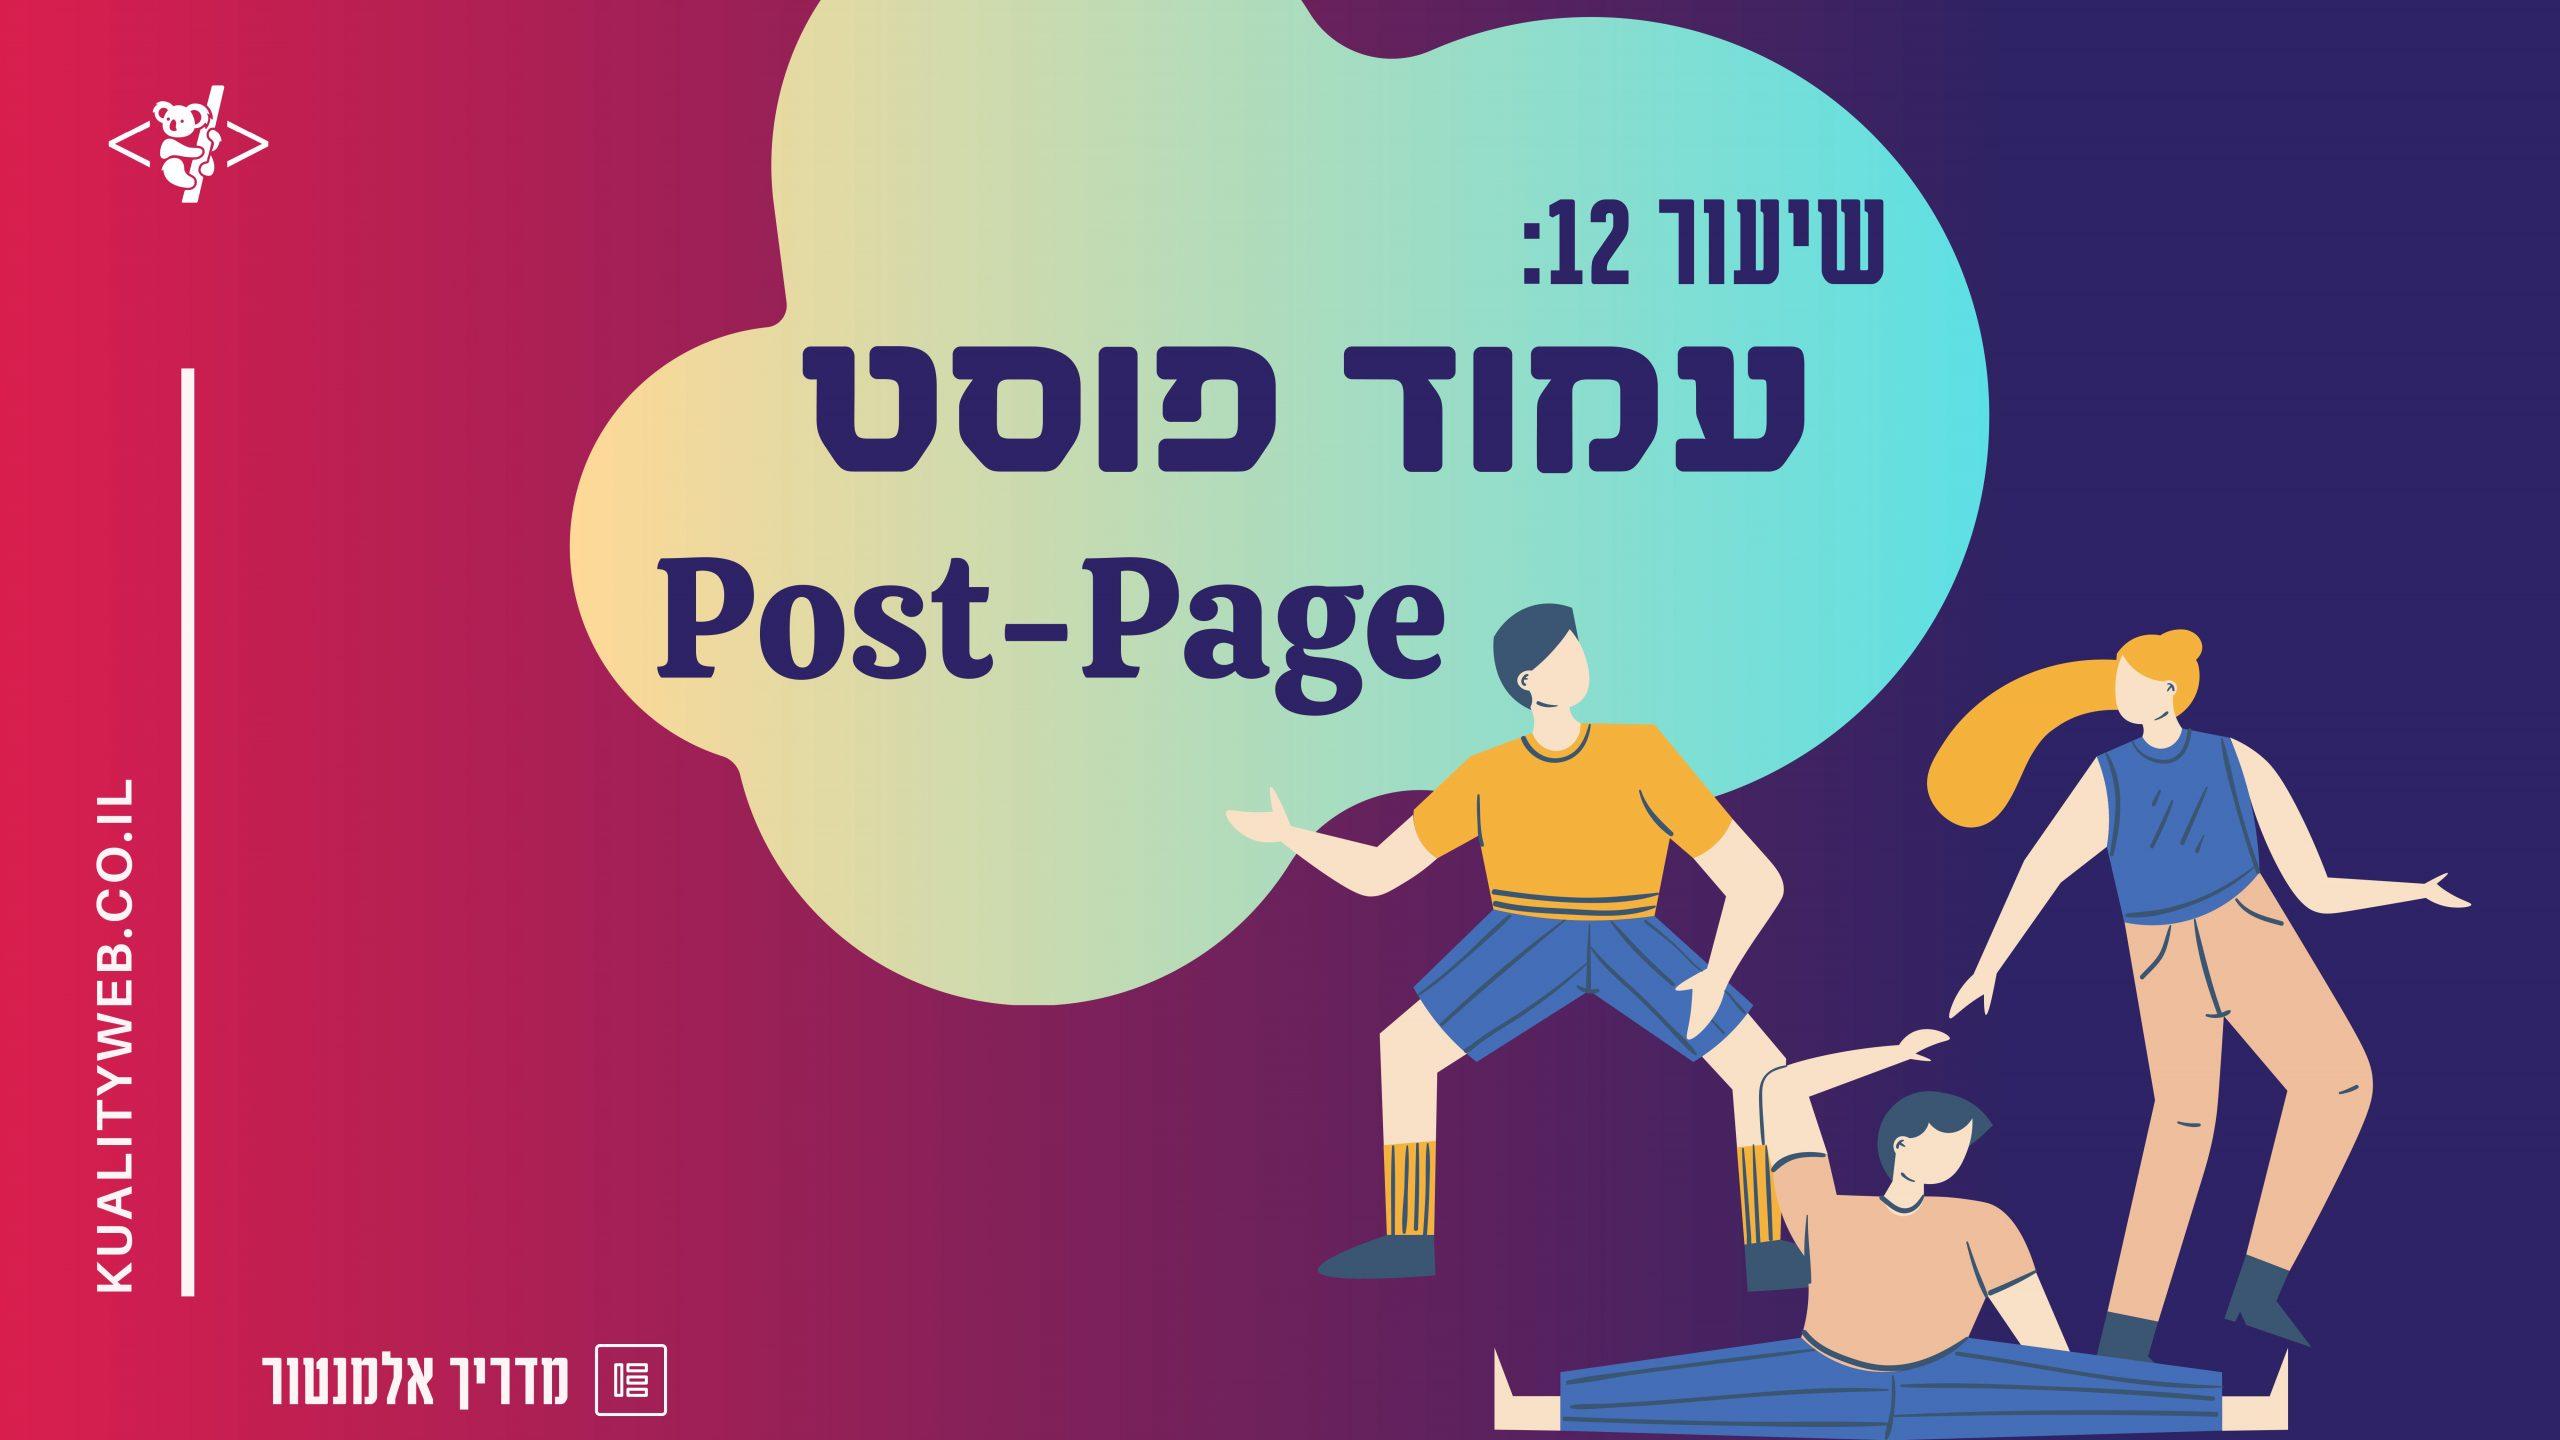 post page, שיר ויצמן, elementor guis, מדריך אלמנטור 2020